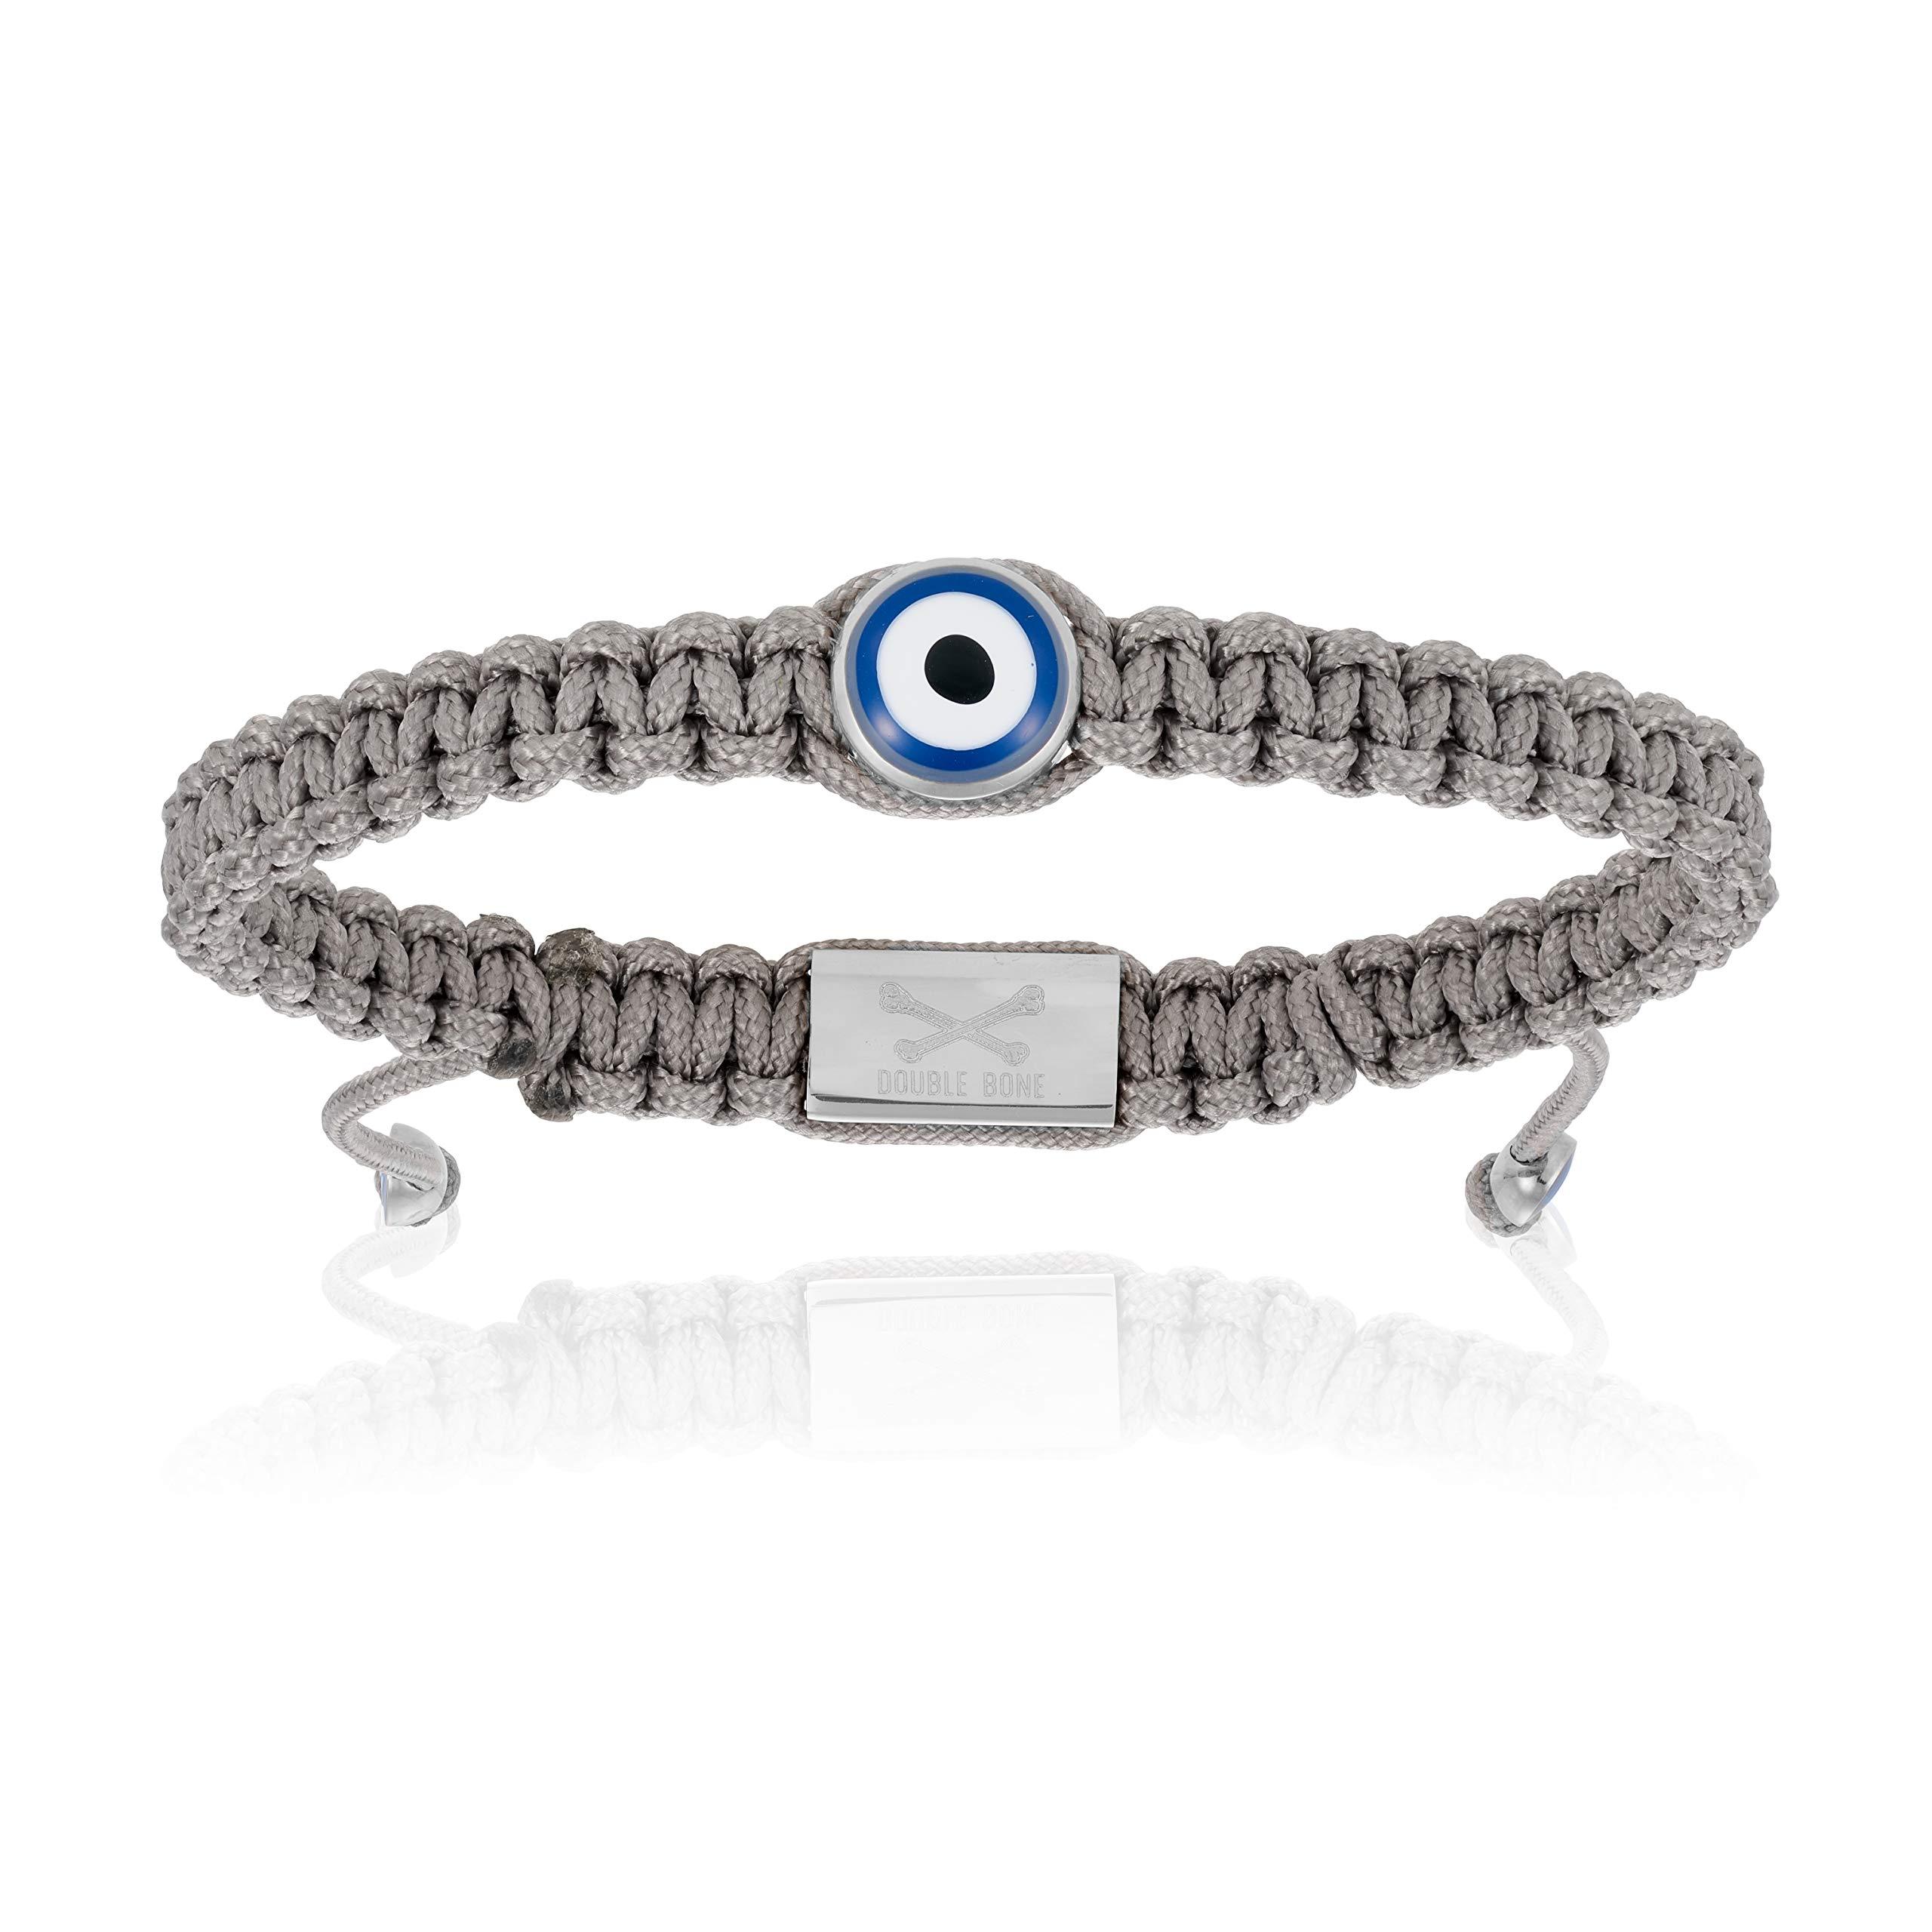 Double Bone Evil Eye Handmade Braided Bracelet with Silver Lucky Eye Unisex and Adjustable (Grey, 18)